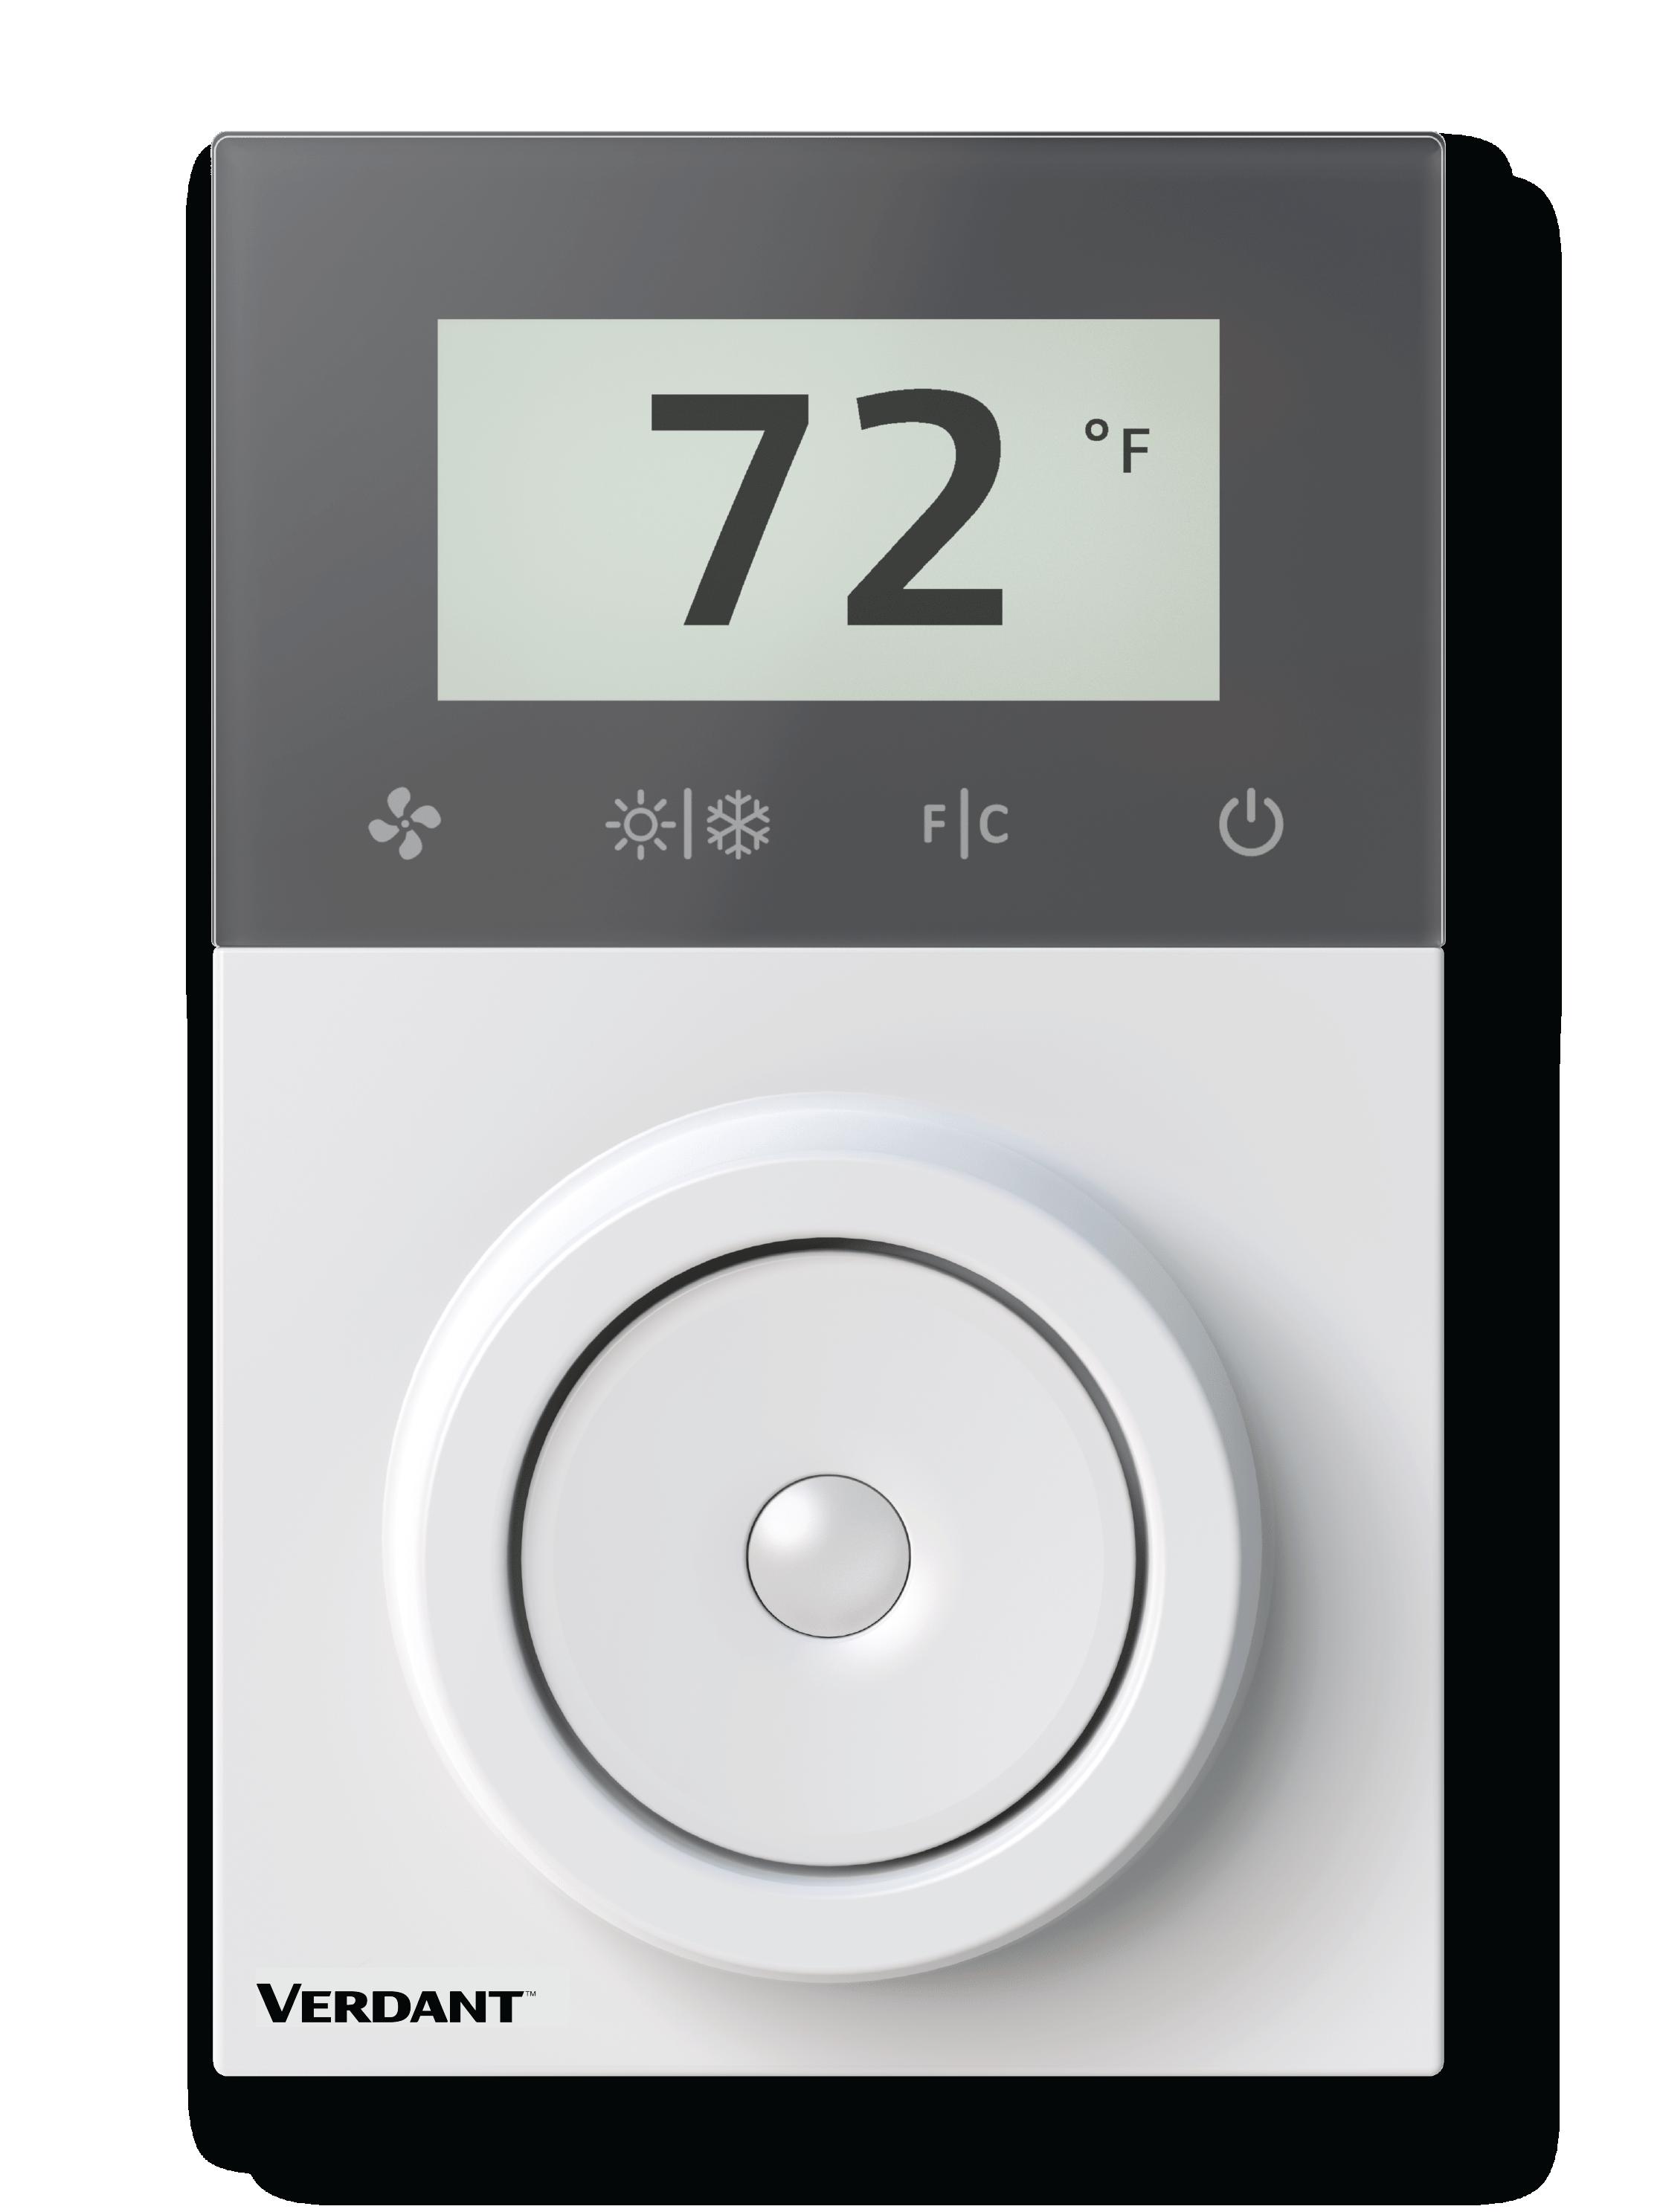 Verdant VX thermostat